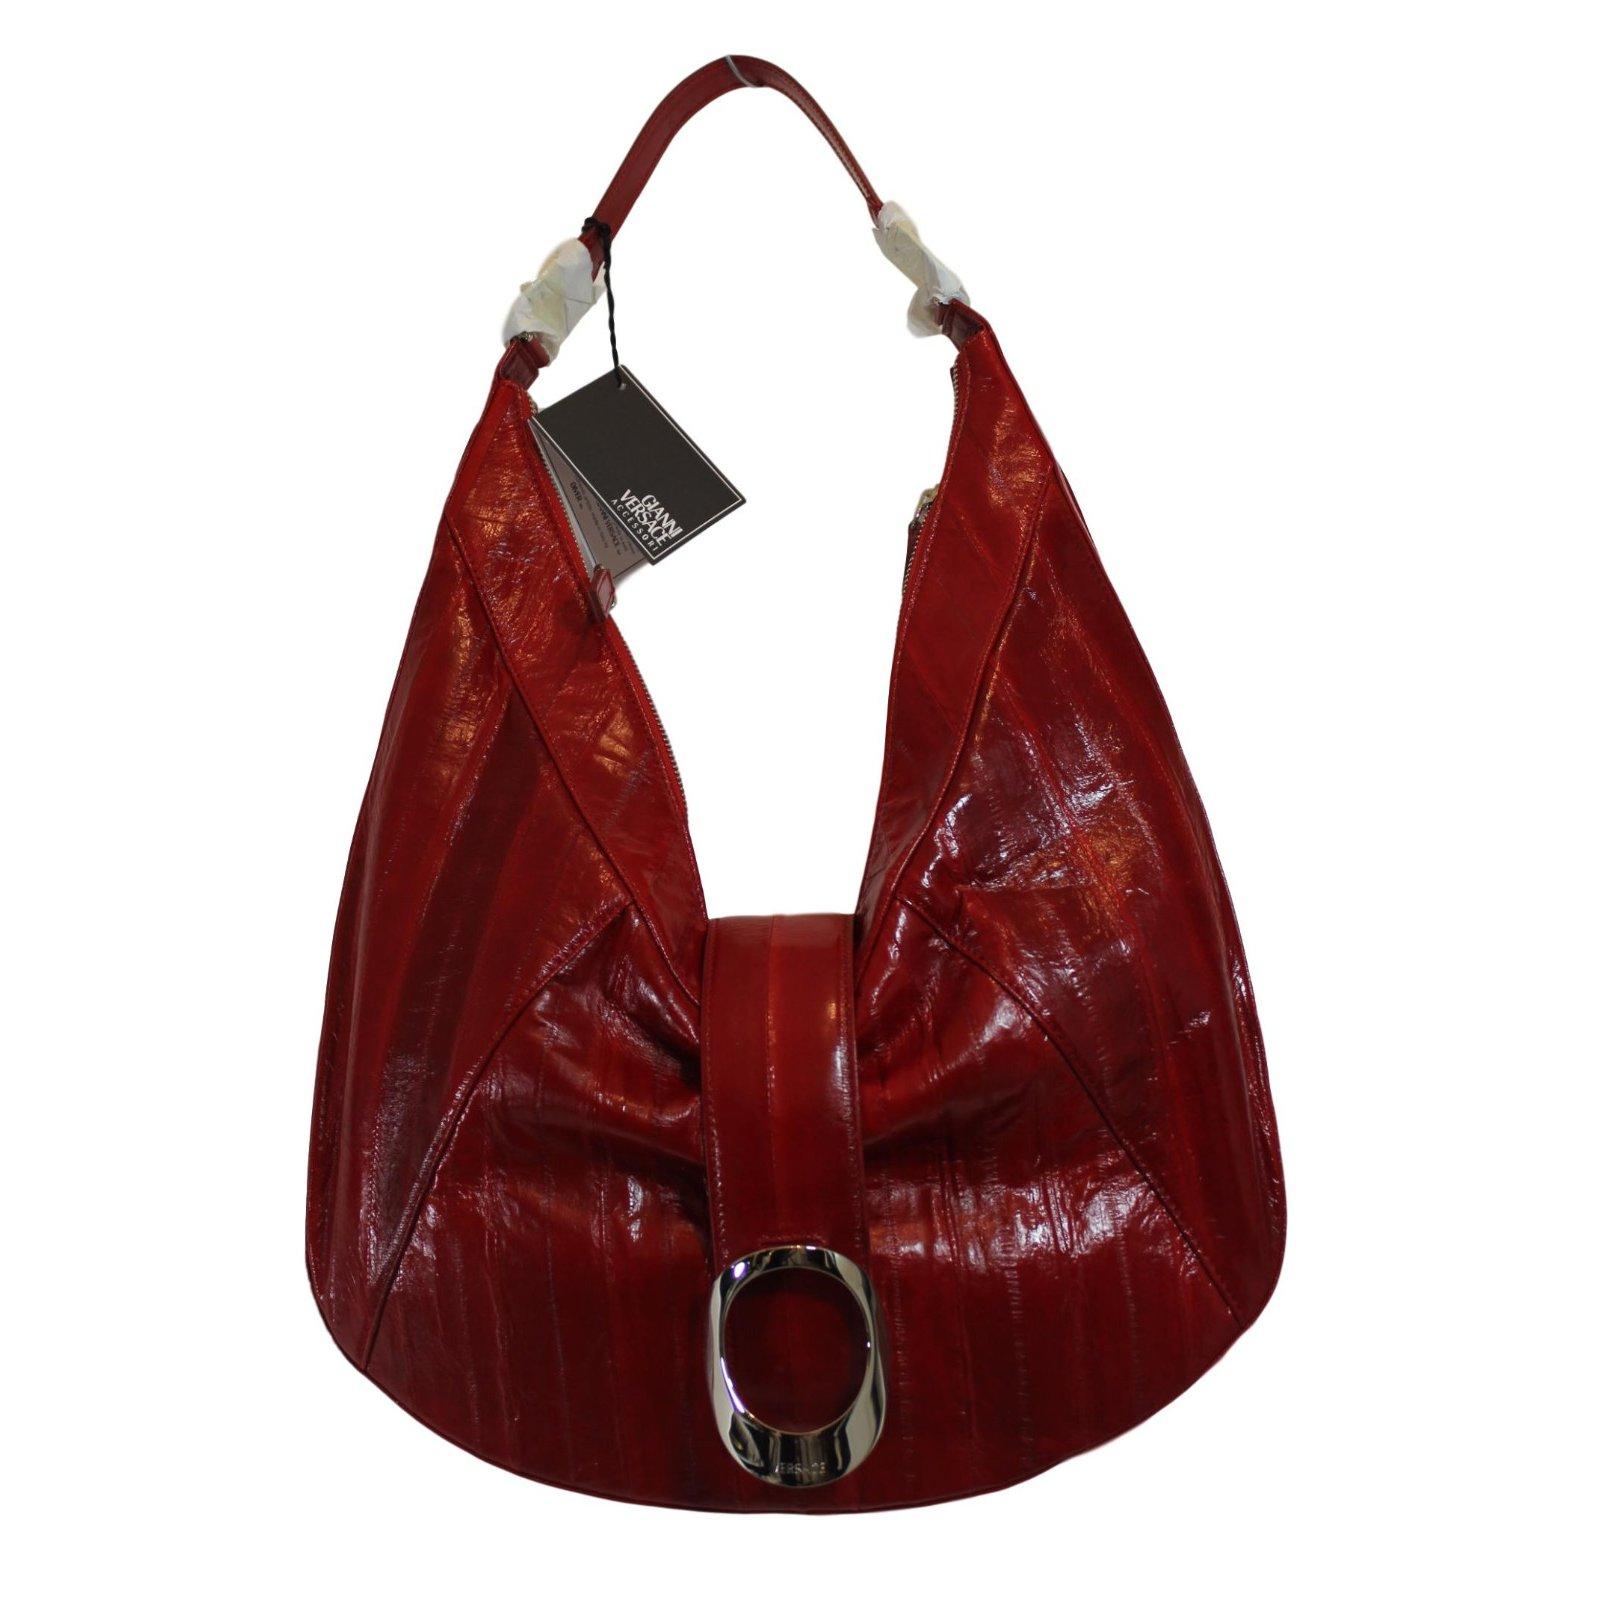 af3e9cd7d3 Gianni Versace Handbag Handbags Other Red ref.52365 - Joli Closet